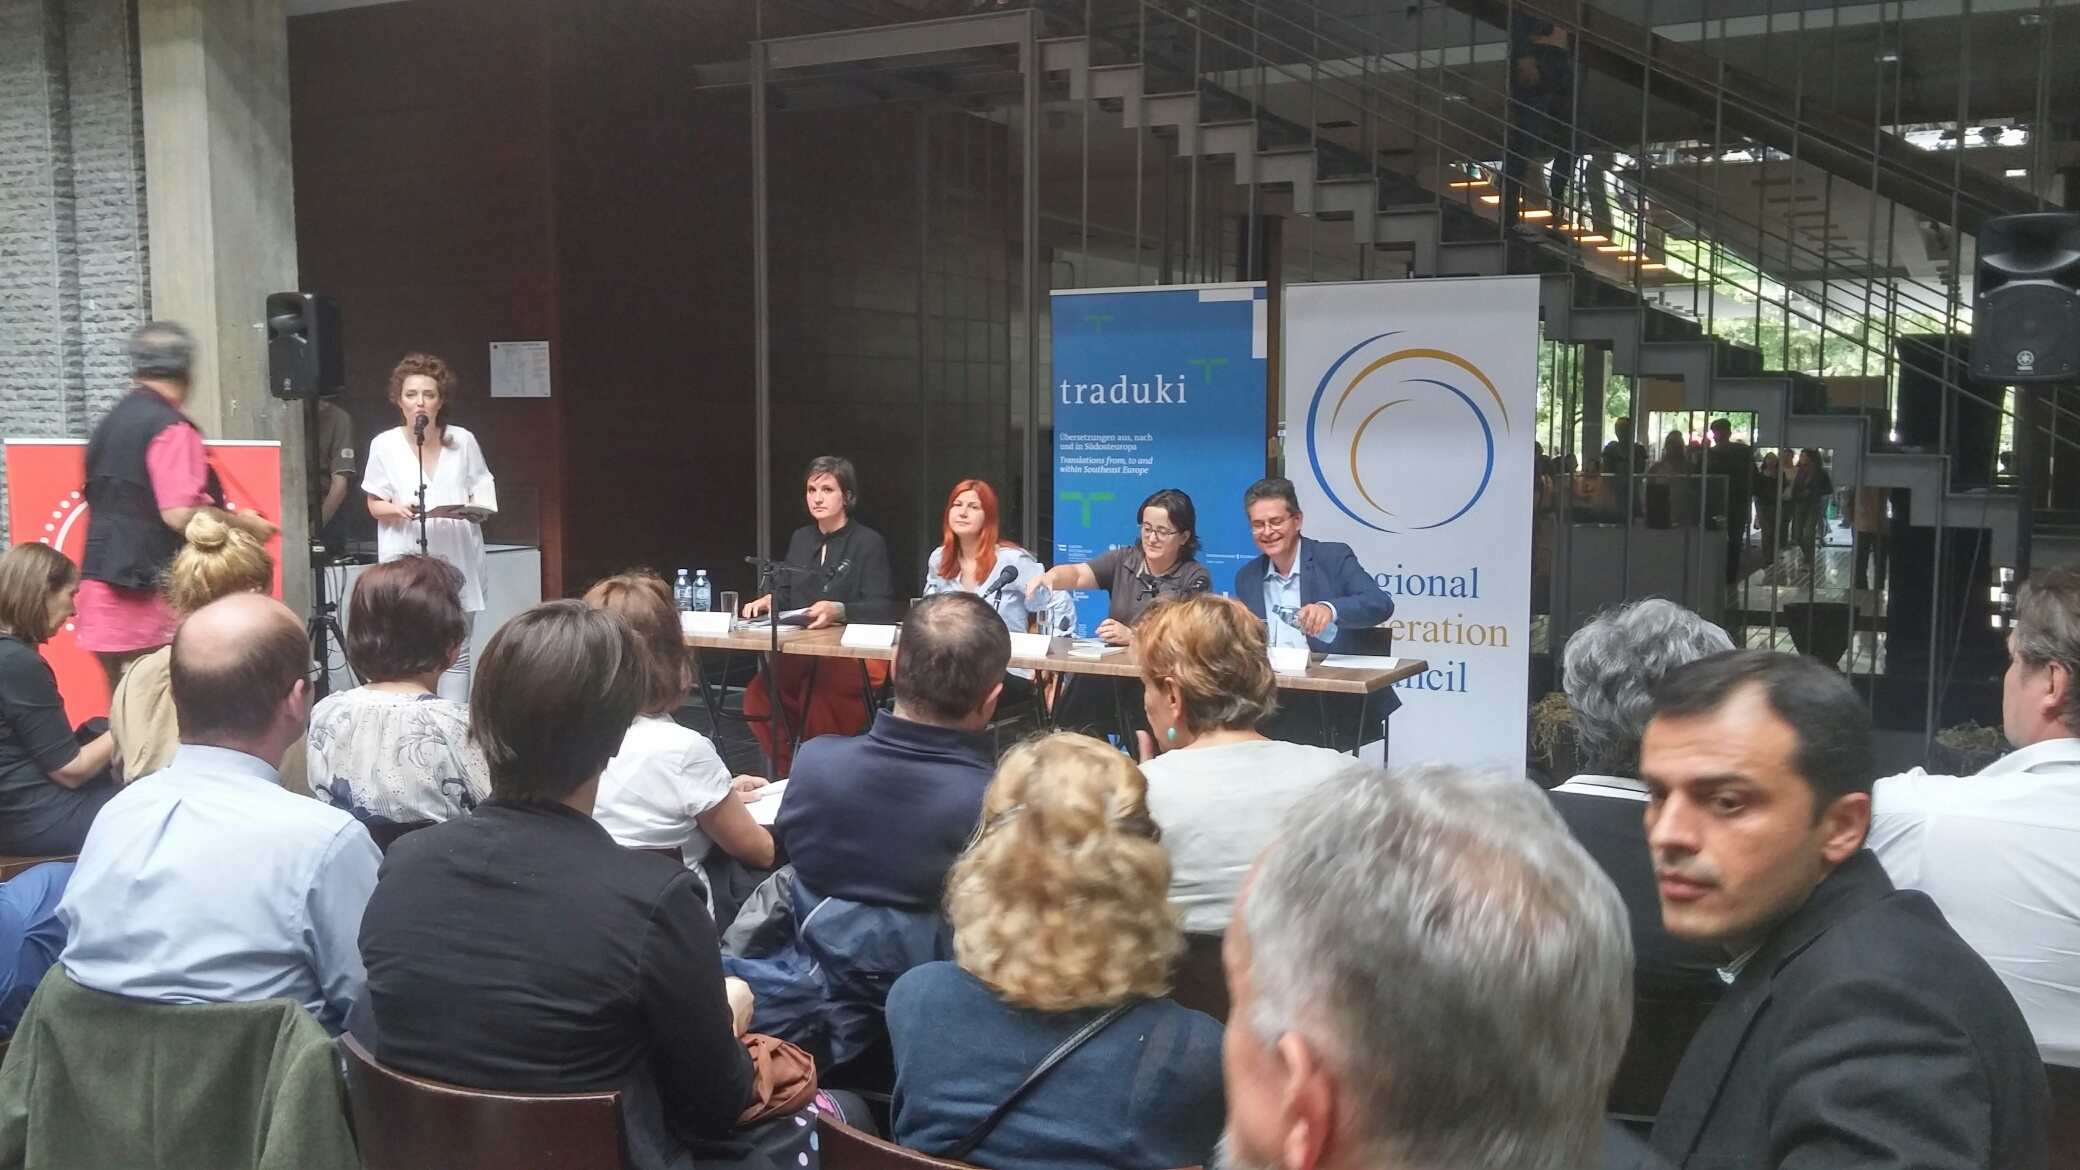 RCC supports two award winning authors from Bosnia and Herzegovina, Lejla Kalamujić (Sarajevo) and Tanja Stupar-Trifunović (Banja Luka), presenting their work to the Belgrade audience at the National Library of Serbia, on 14 June 2016. (Photo: RCC/Ratka Babic)